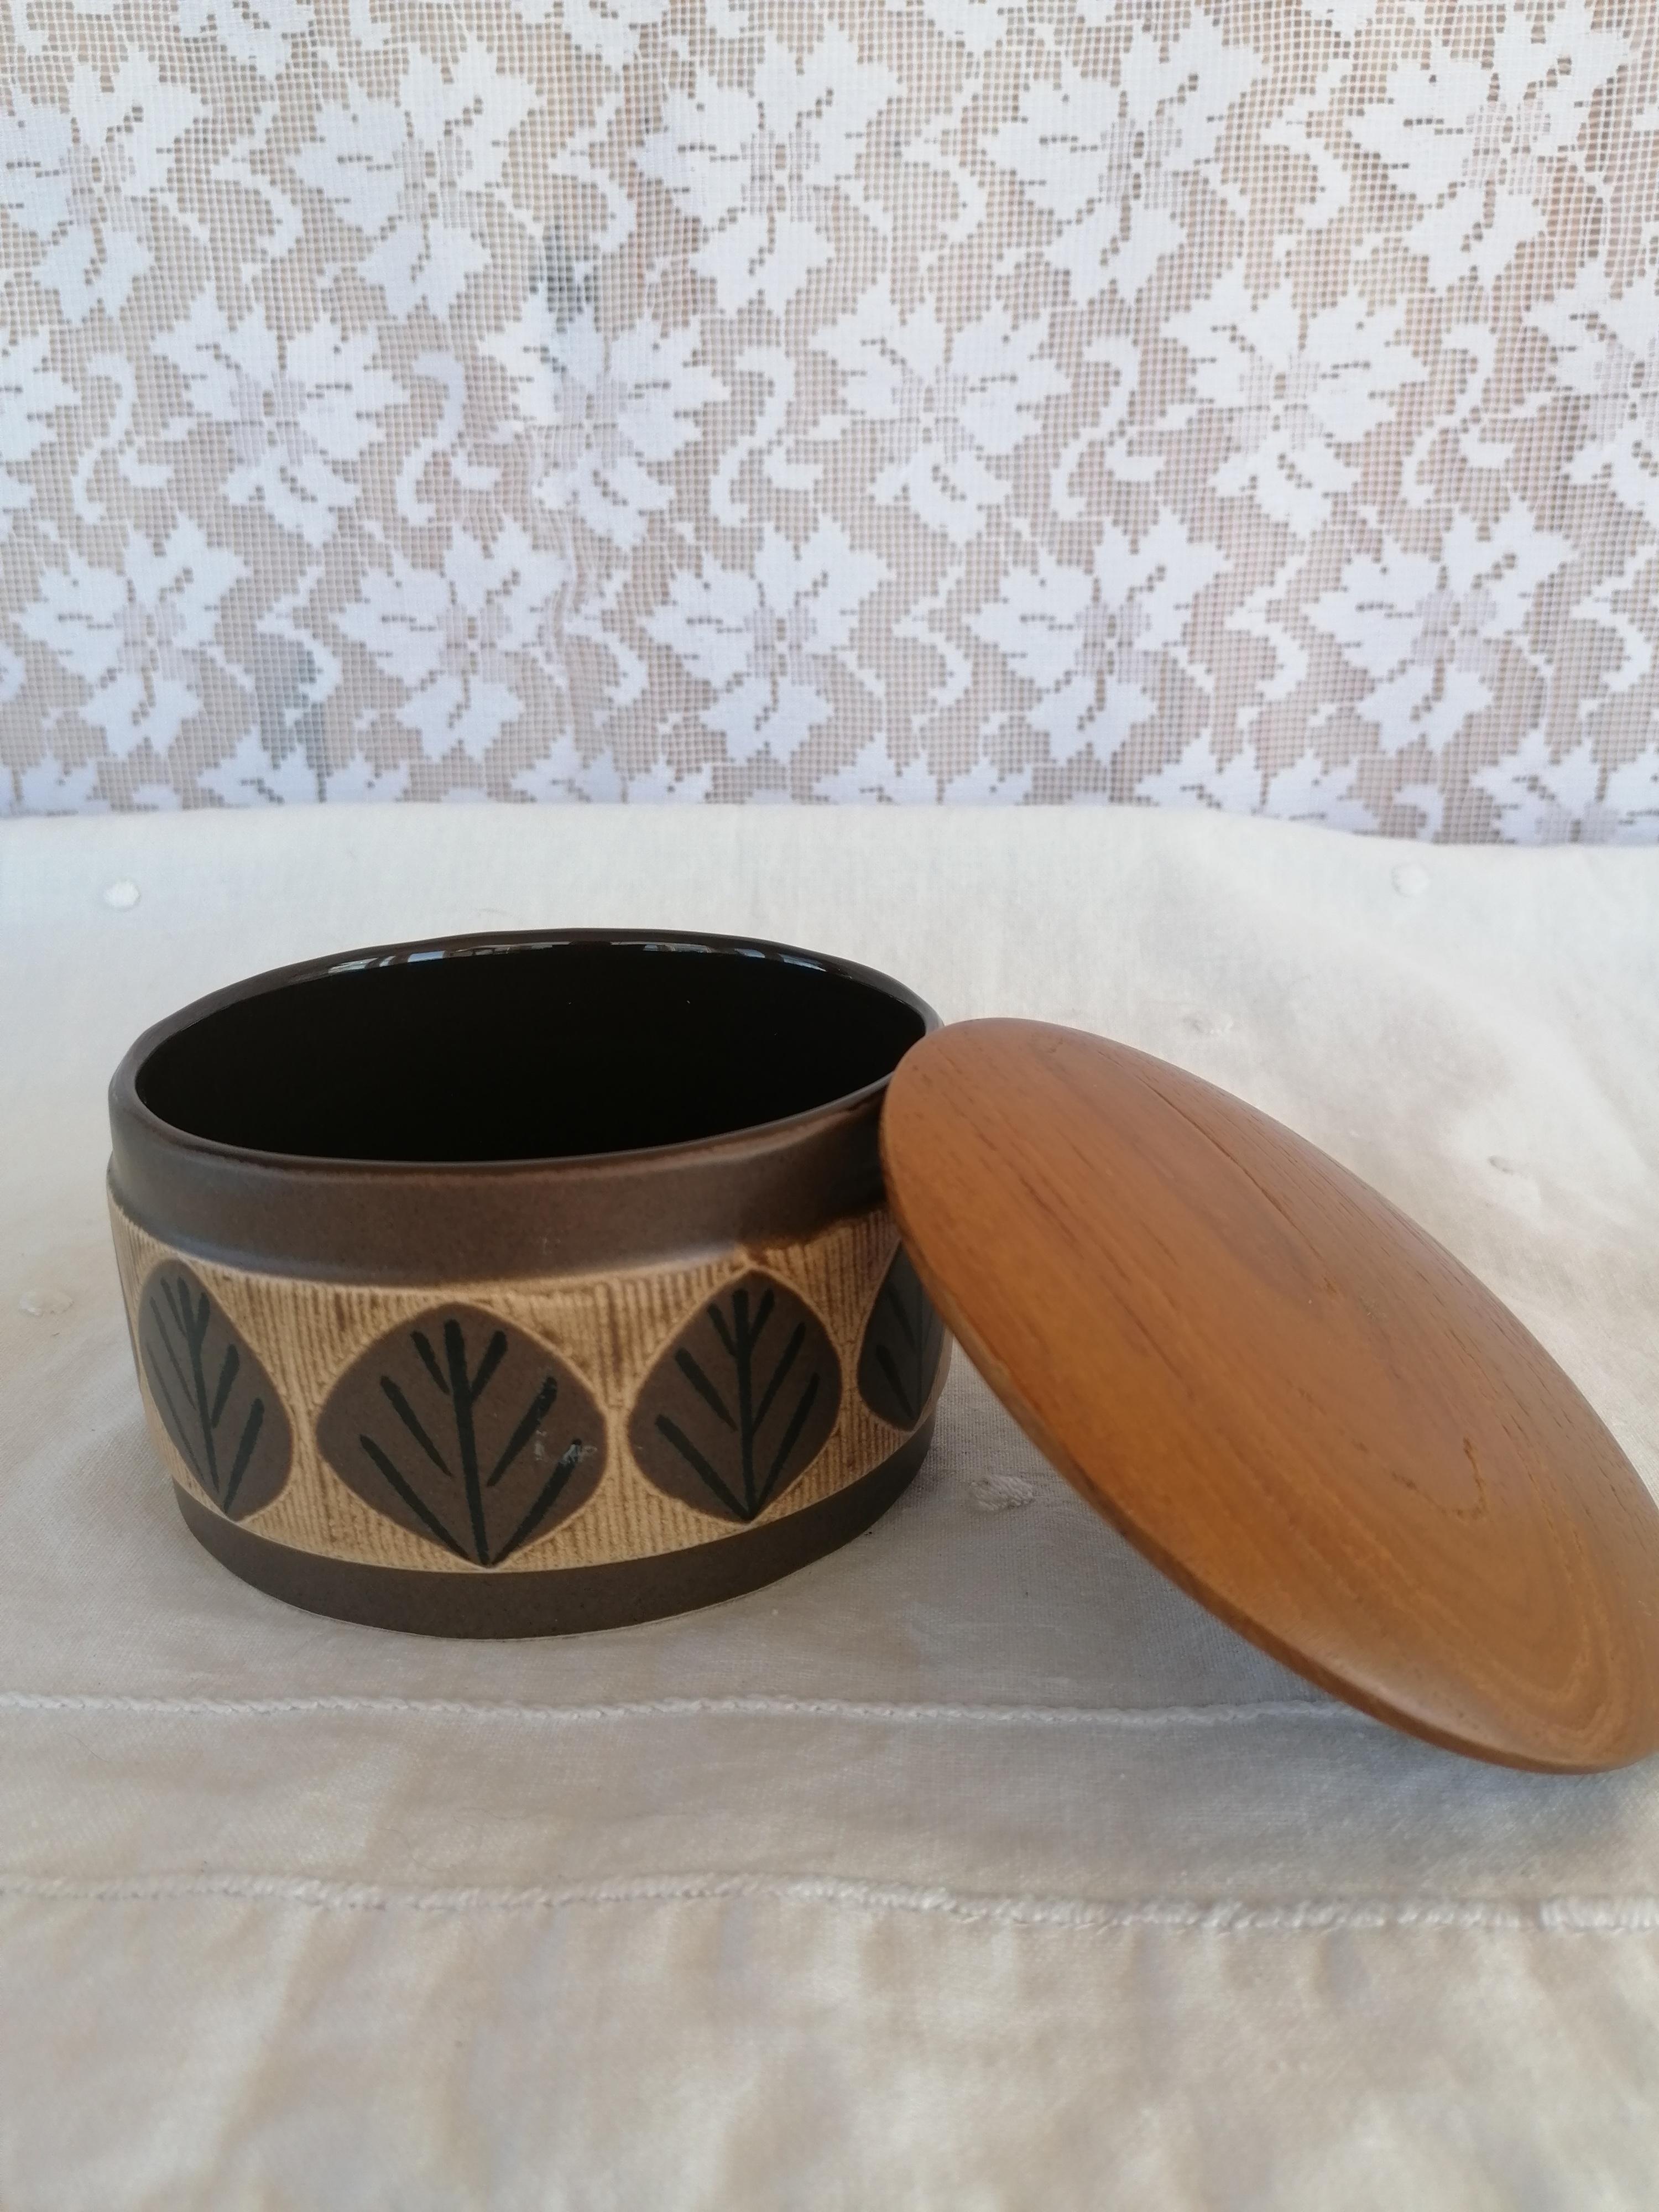 Keramikburk med teaklock Anita Nylund Syco